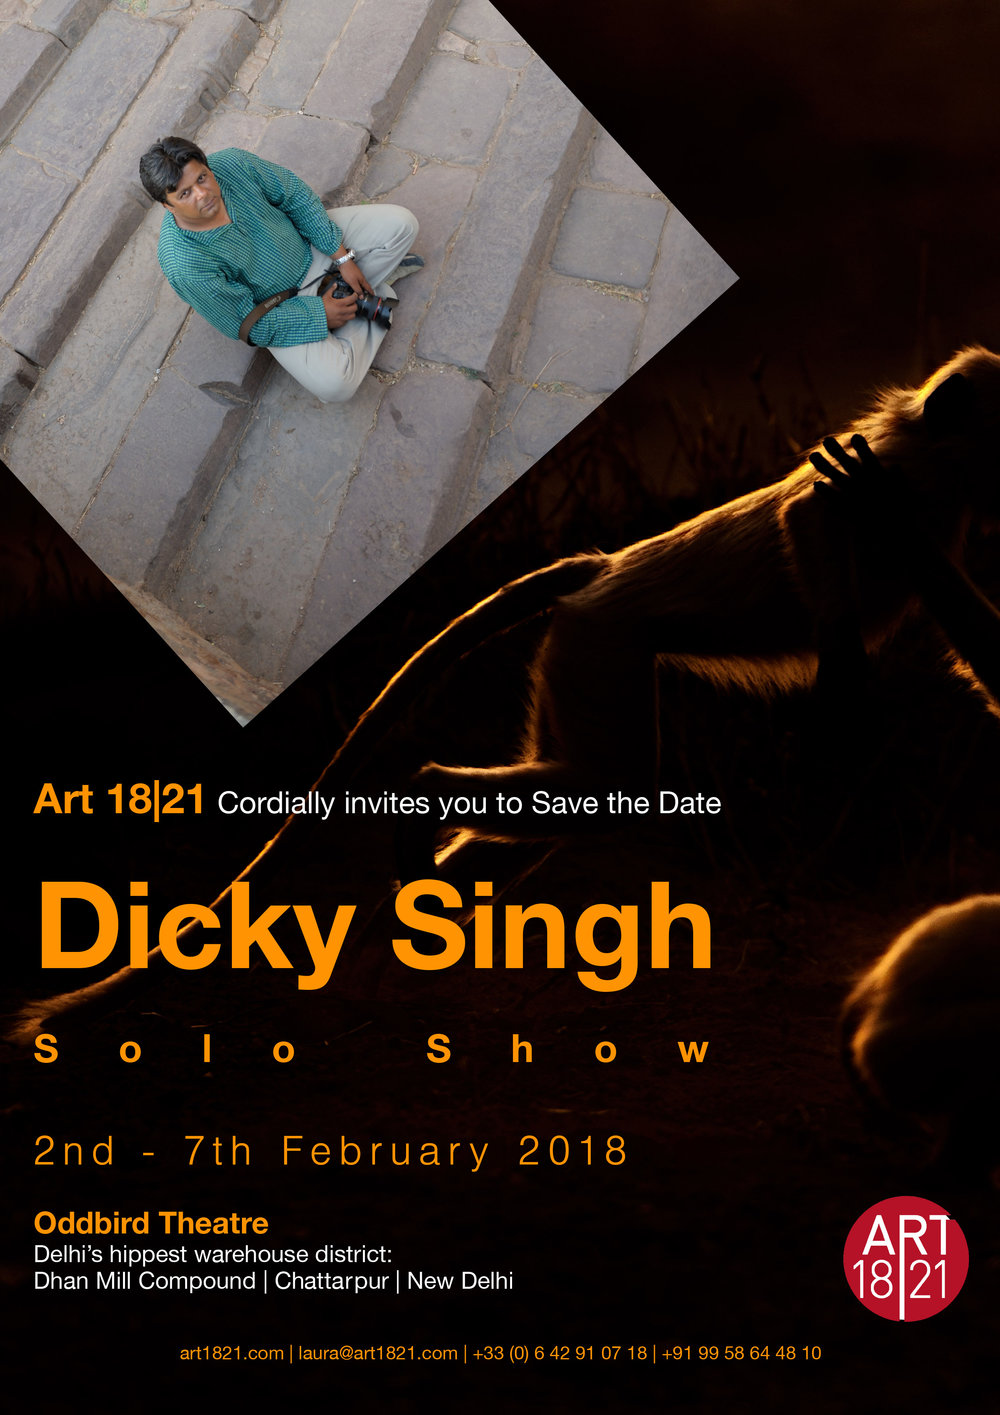 Dicky show dates.jpg